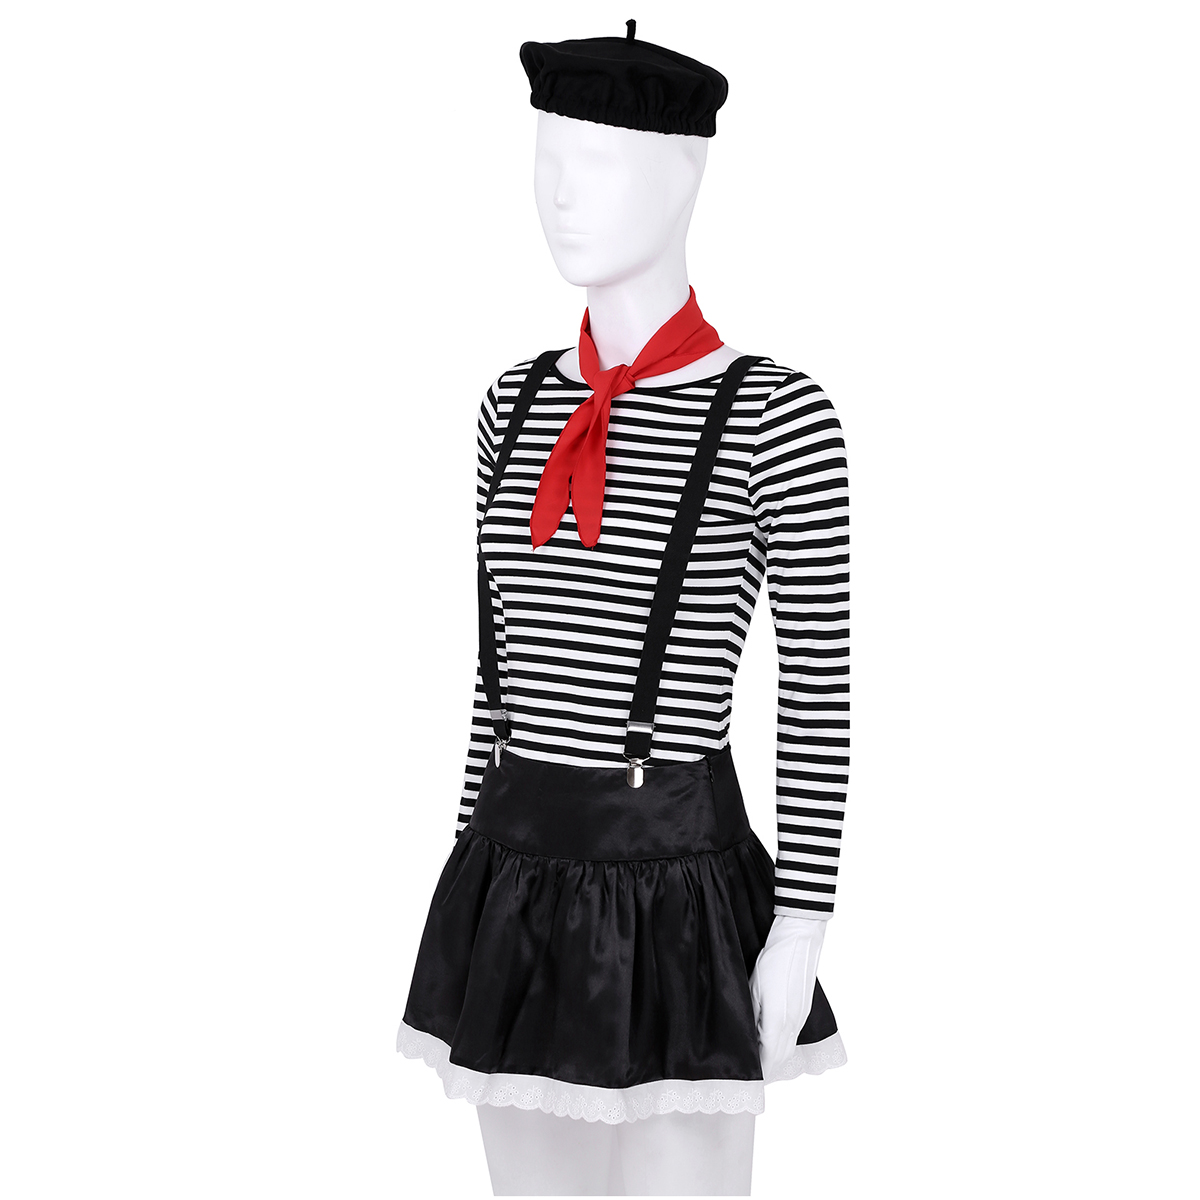 Pantomime Circus Clown Fancy Costume Multi-Color Fancy Dress For Adults Unisex